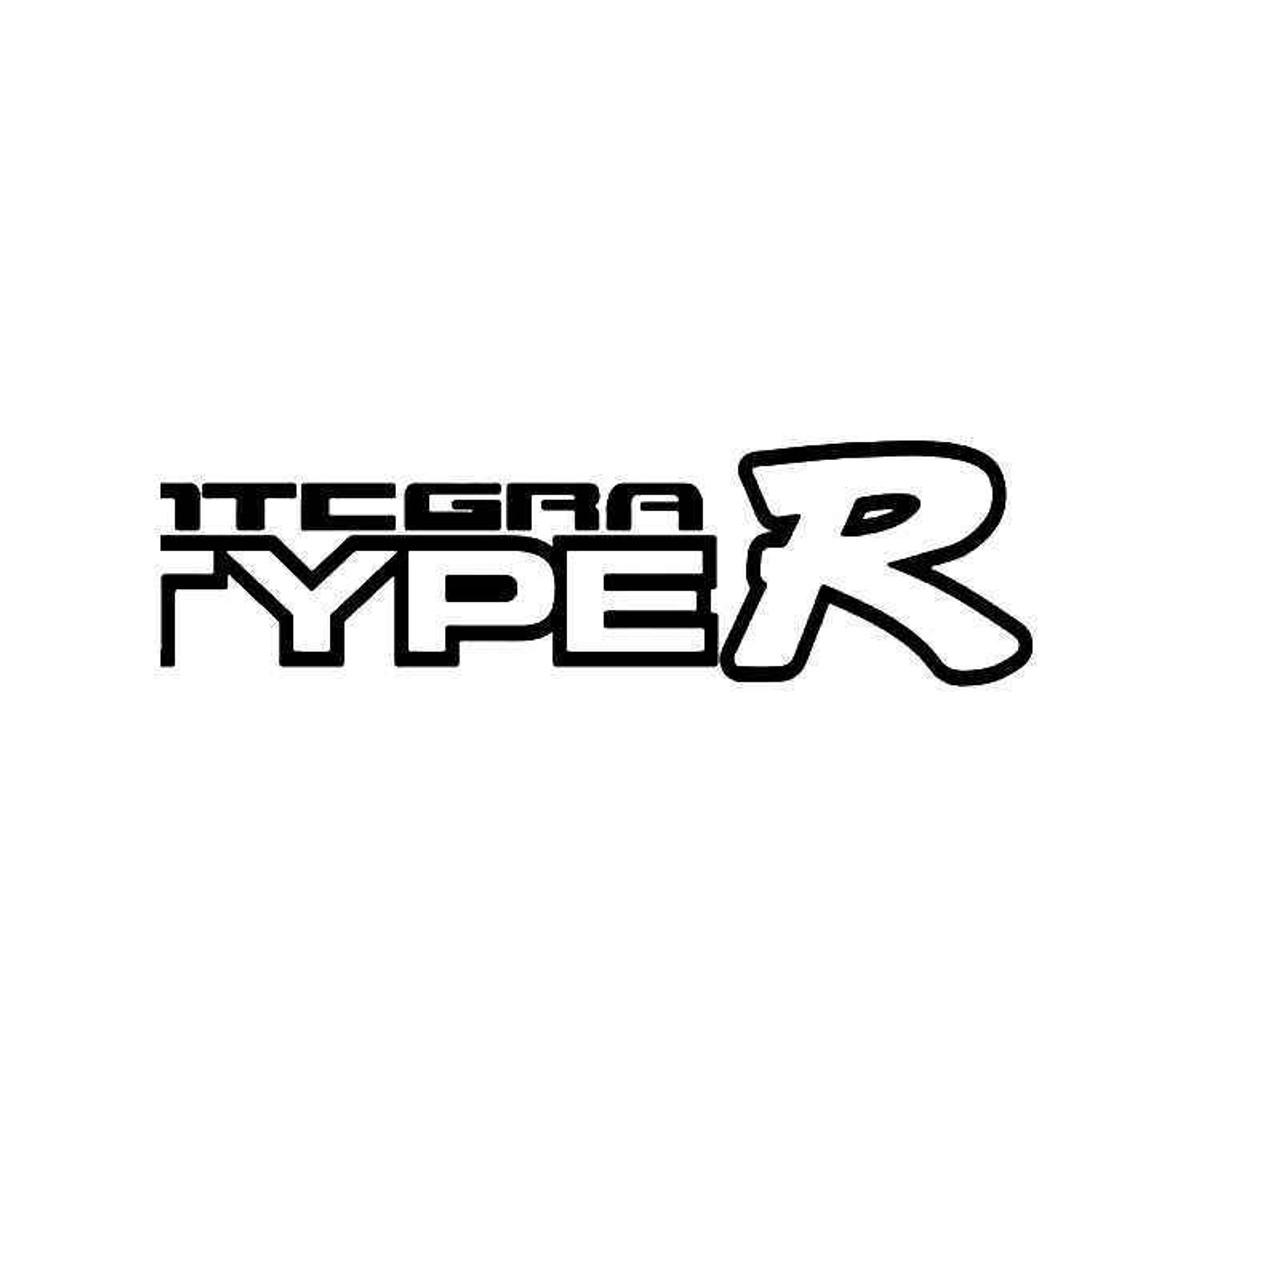 Acura integra type r 2 vinyl sticker